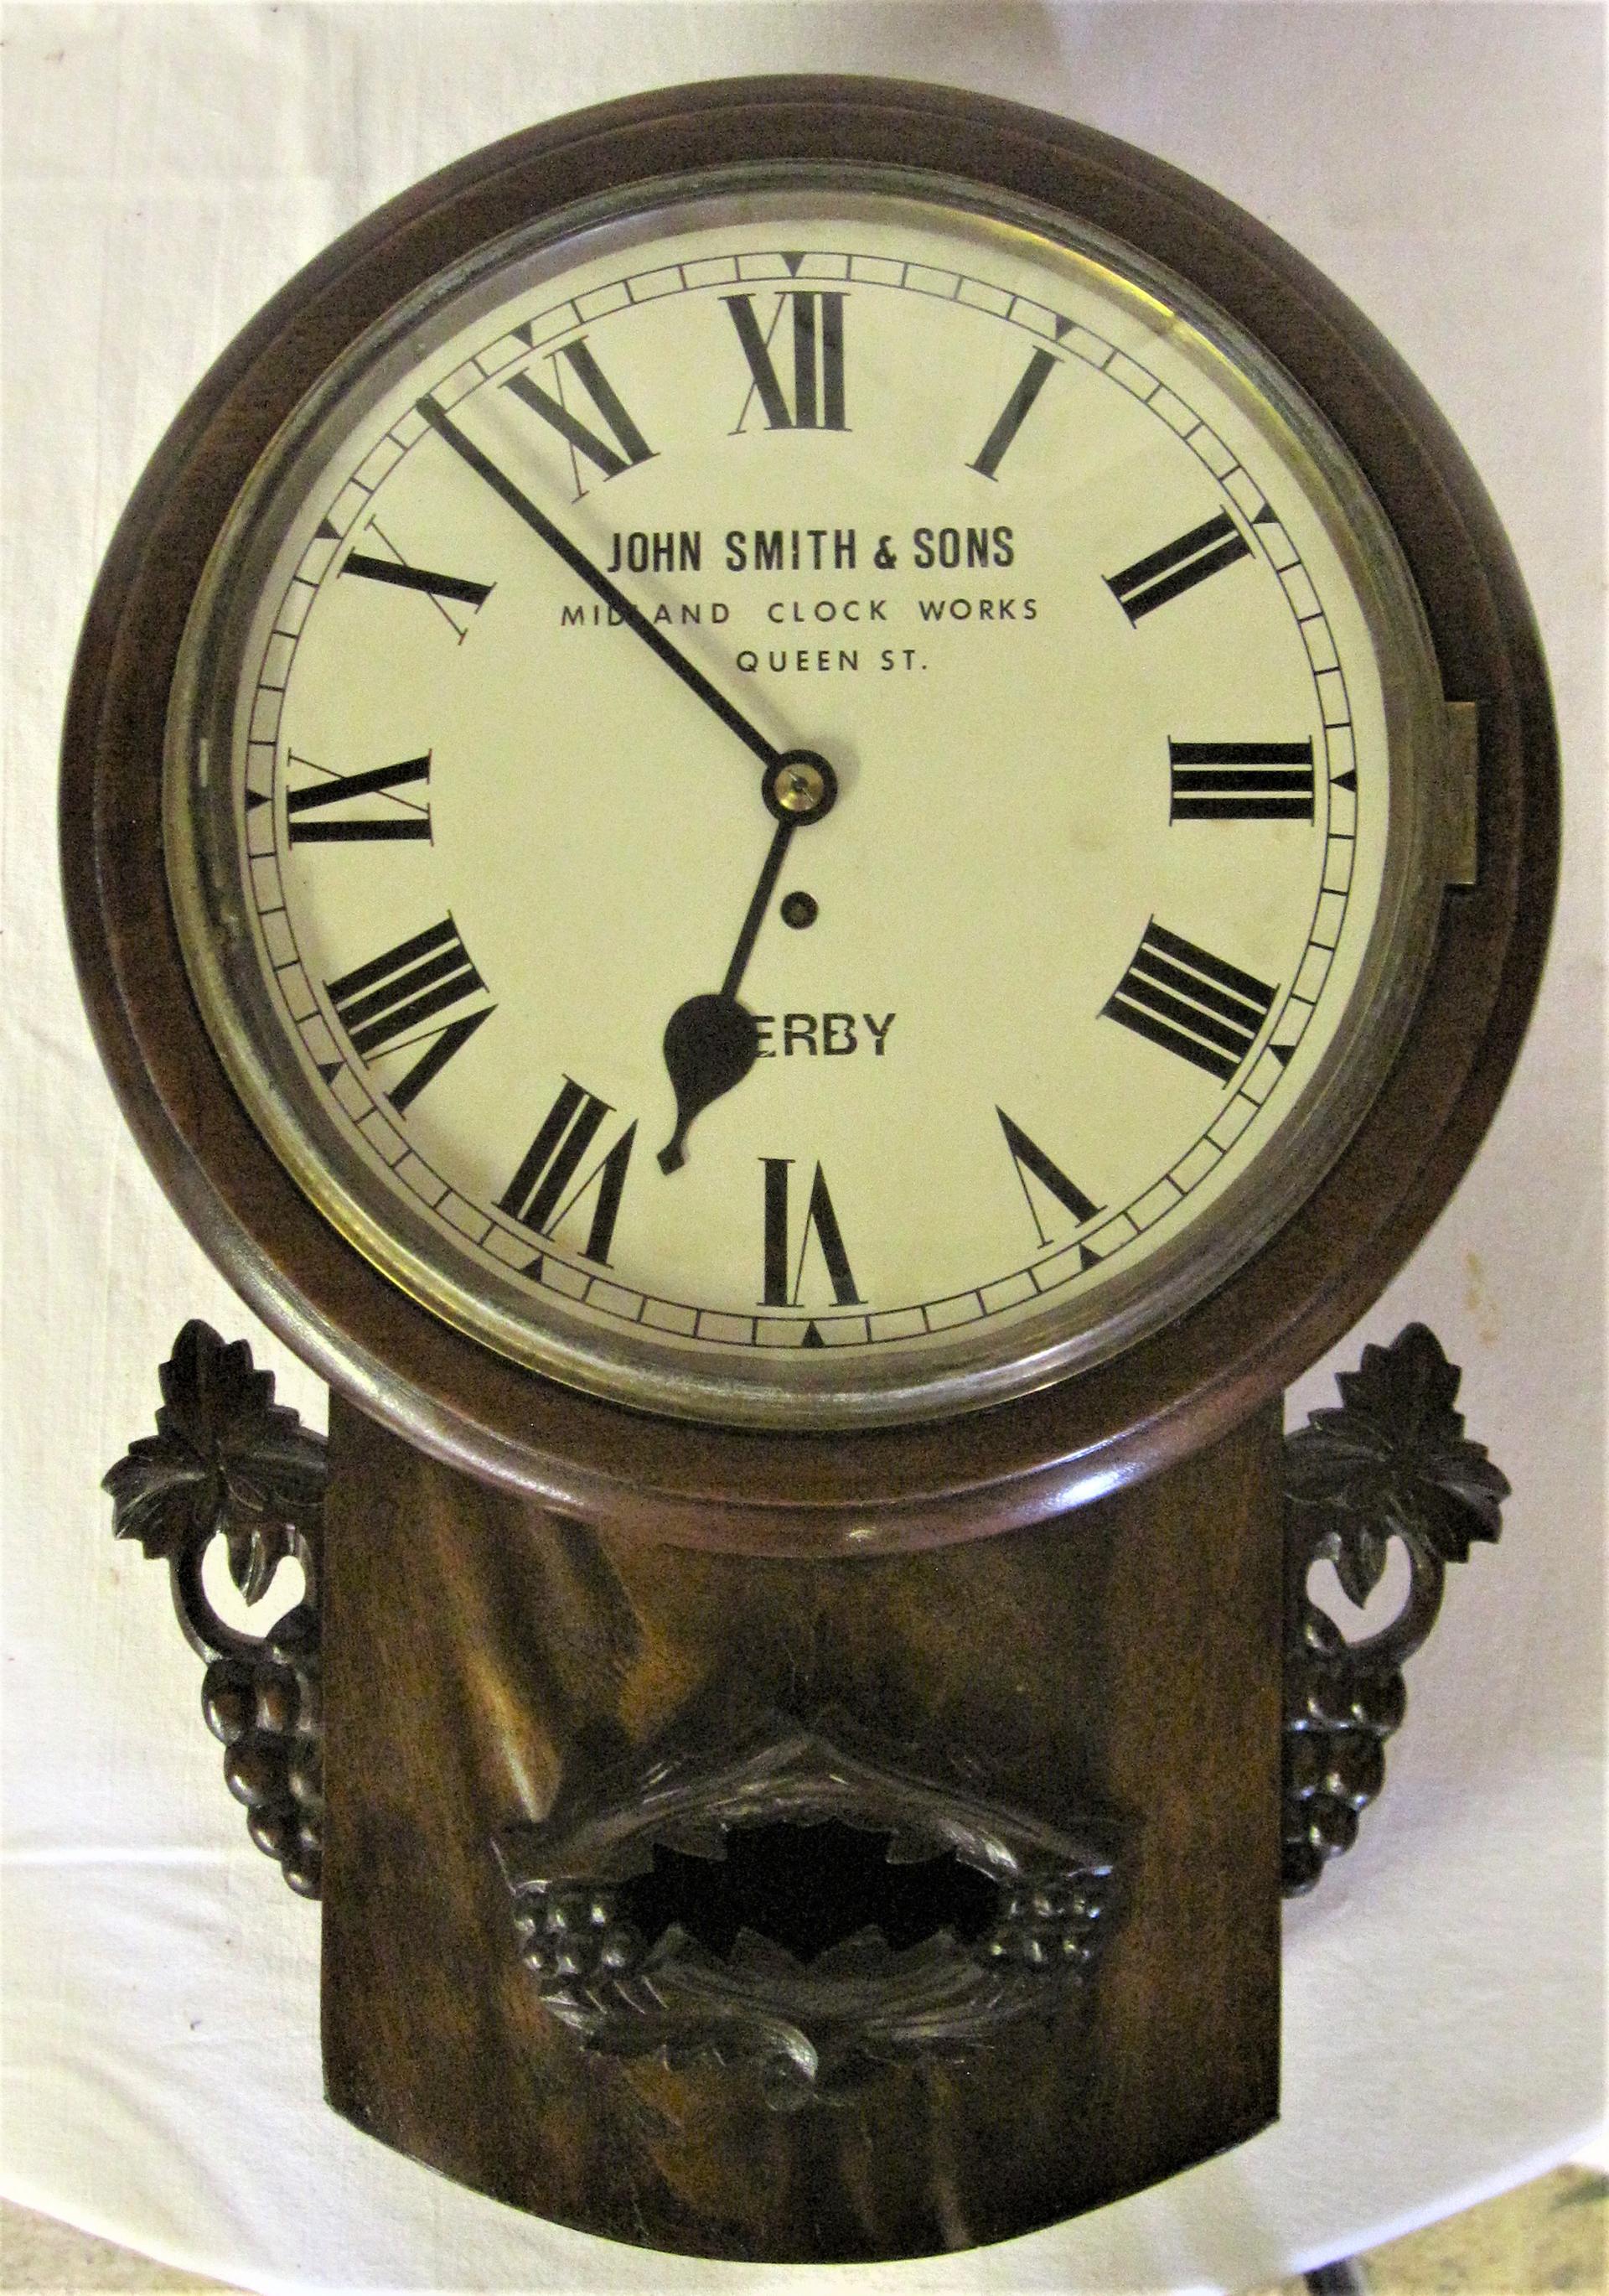 Midland Railway Mahogany 12 inch Fuse clock. Restored dial with original dial underneath. MIDLAND